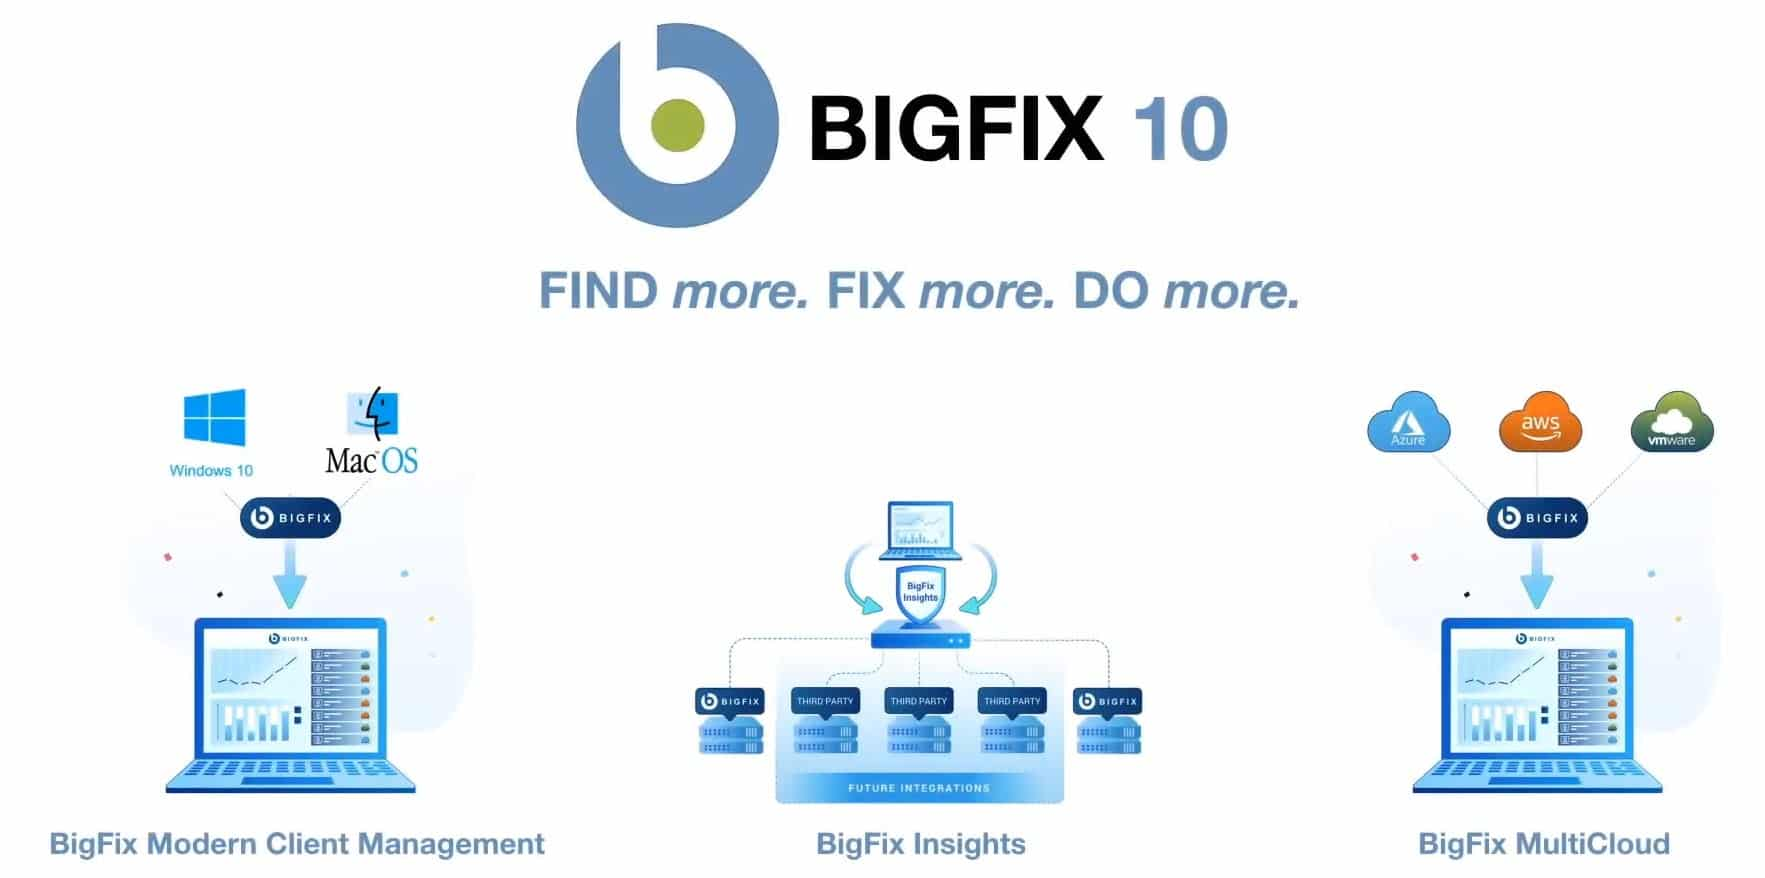 Bigfix10